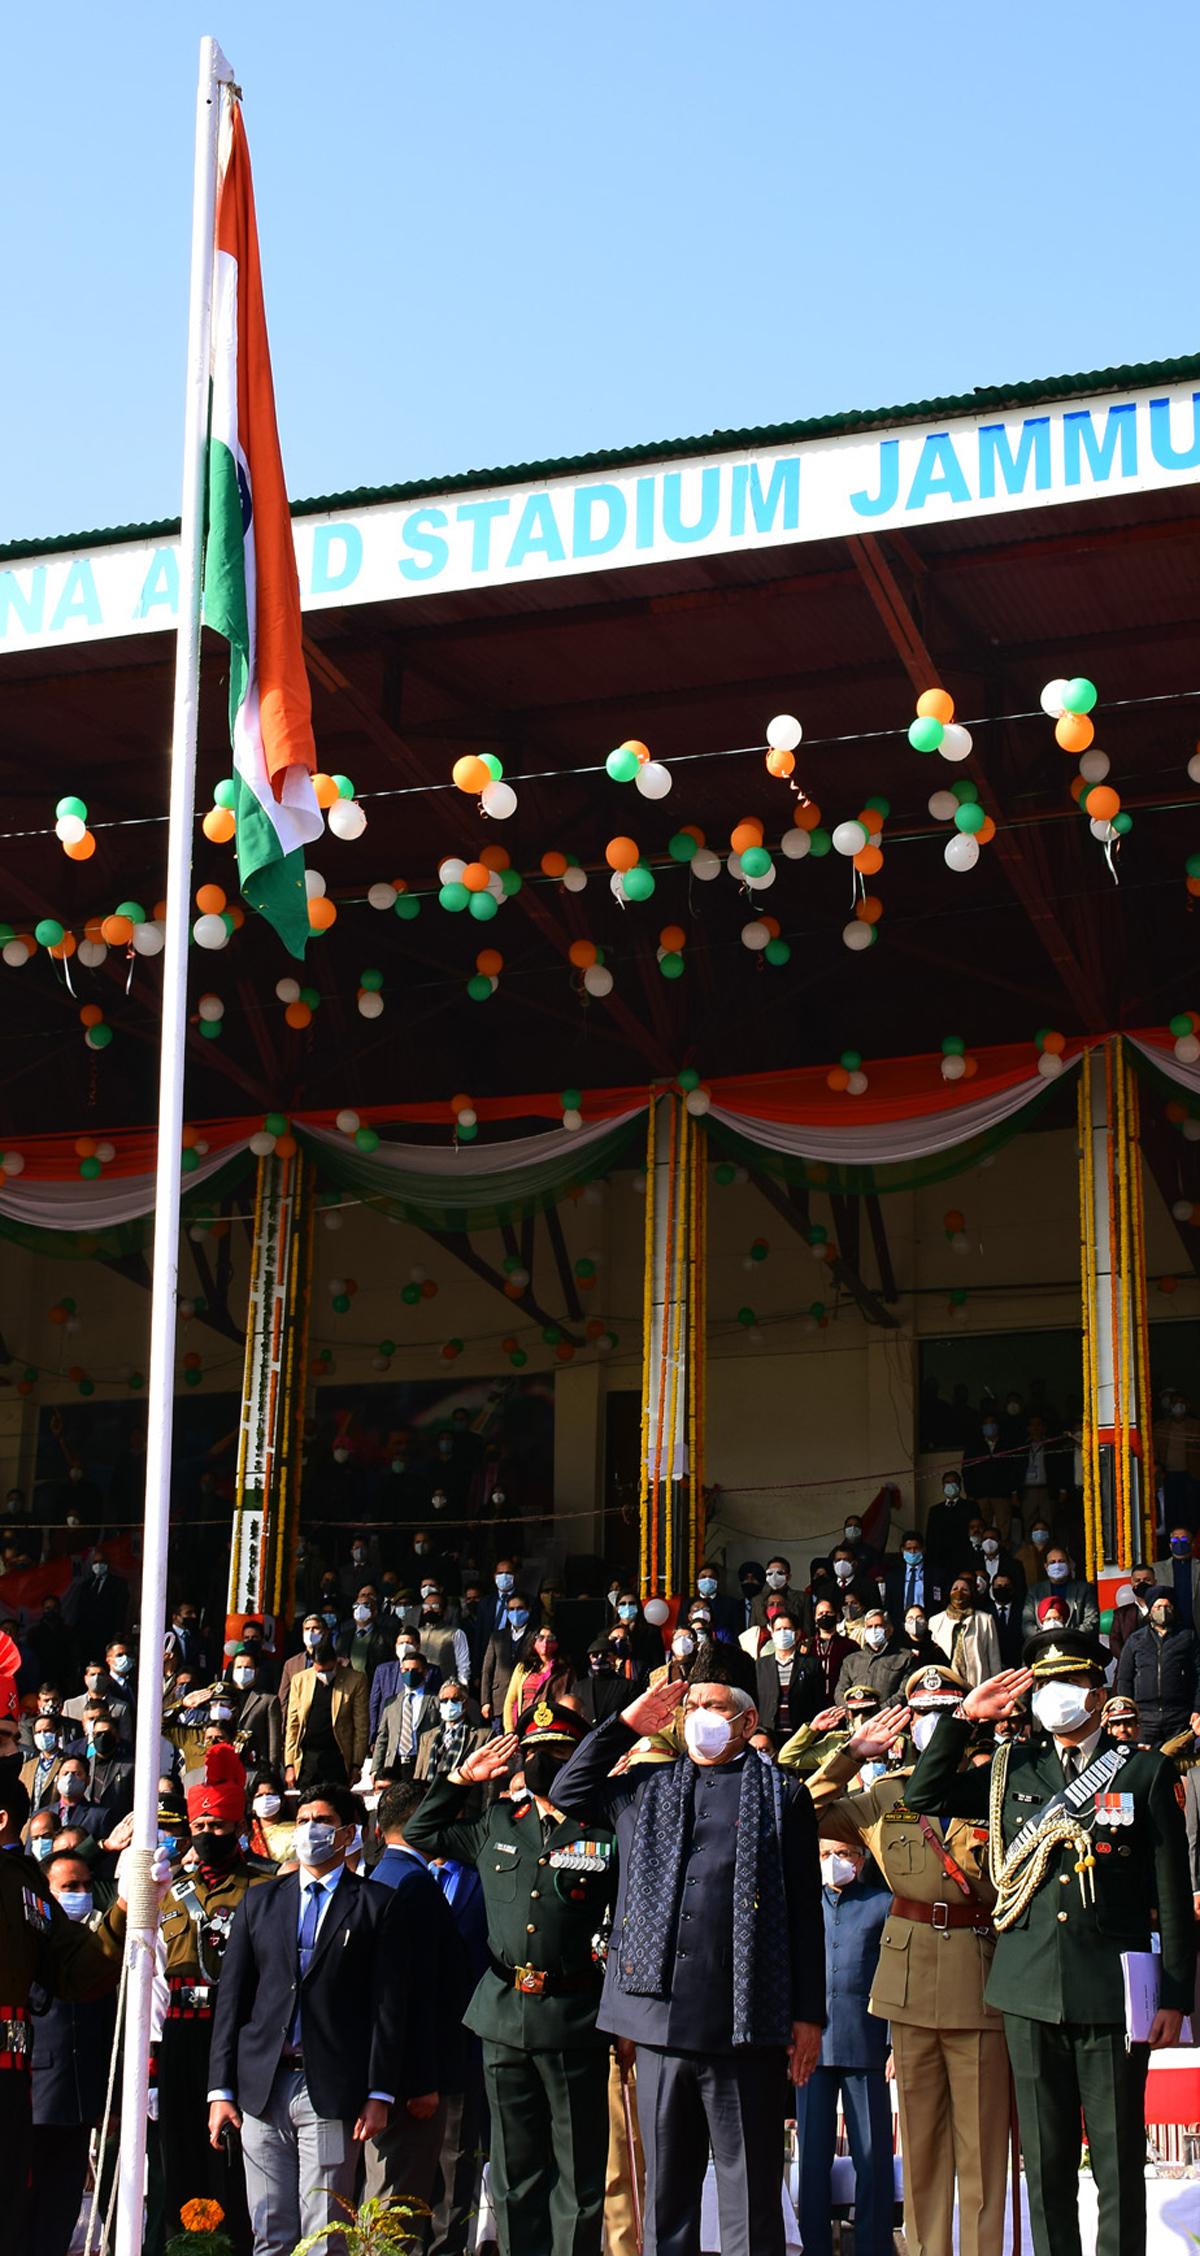 Lt Governor Manoj Sinha hoisting National Flag at Republic Day function in Jammu.